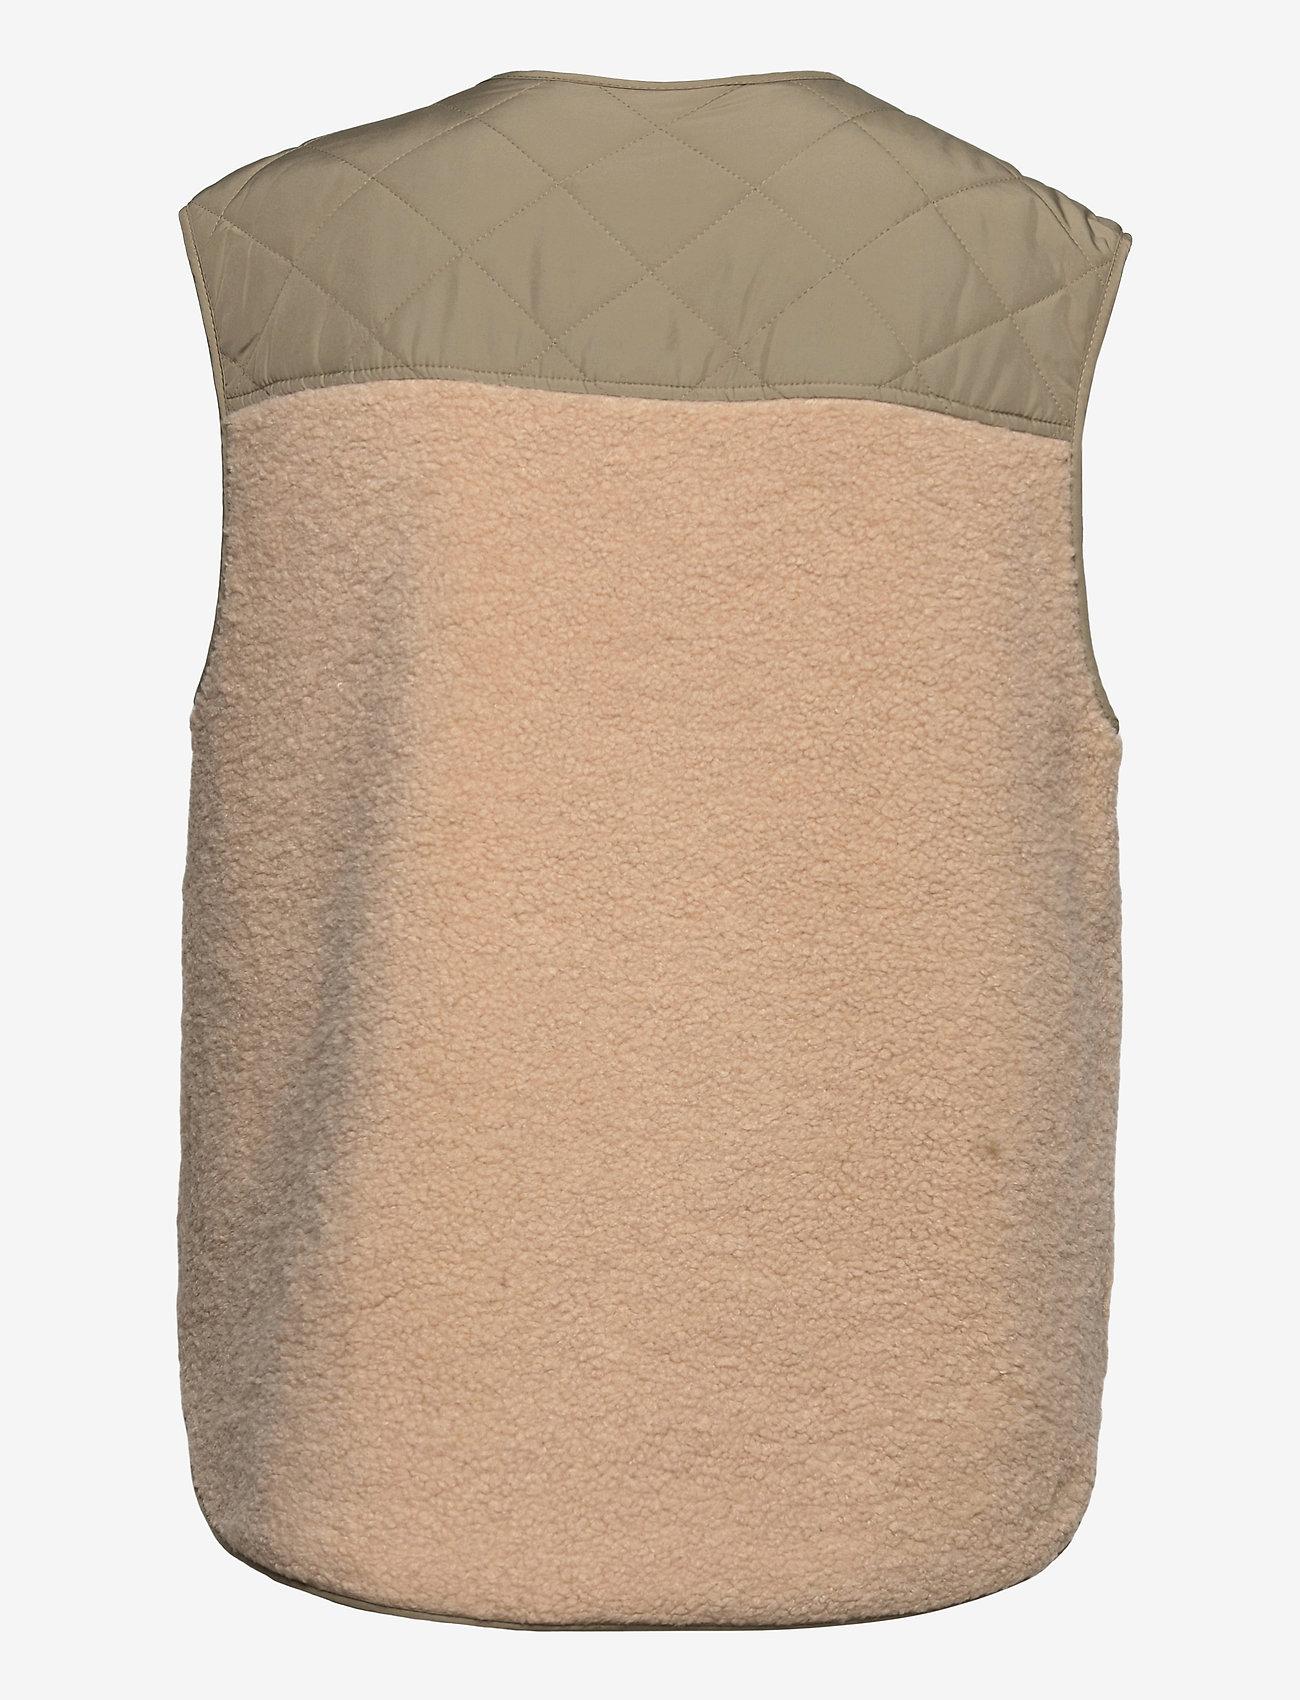 Global Funk - Vinson - knitted vests - khaki sugar mix - 1